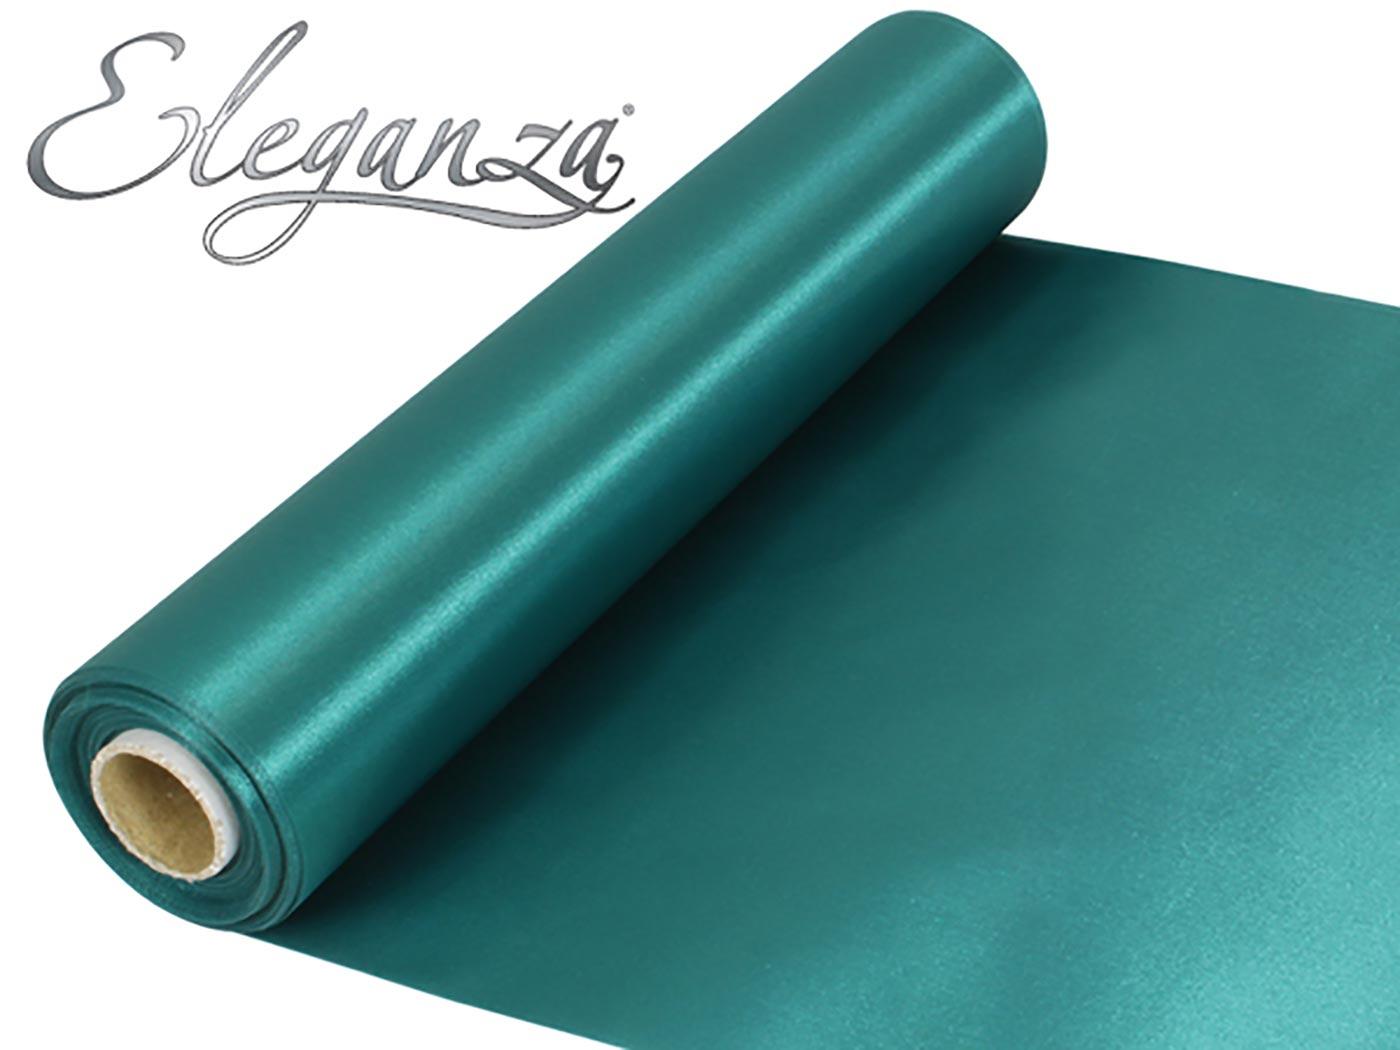 Eleganza Satin Fabric 29cm x 20m Green